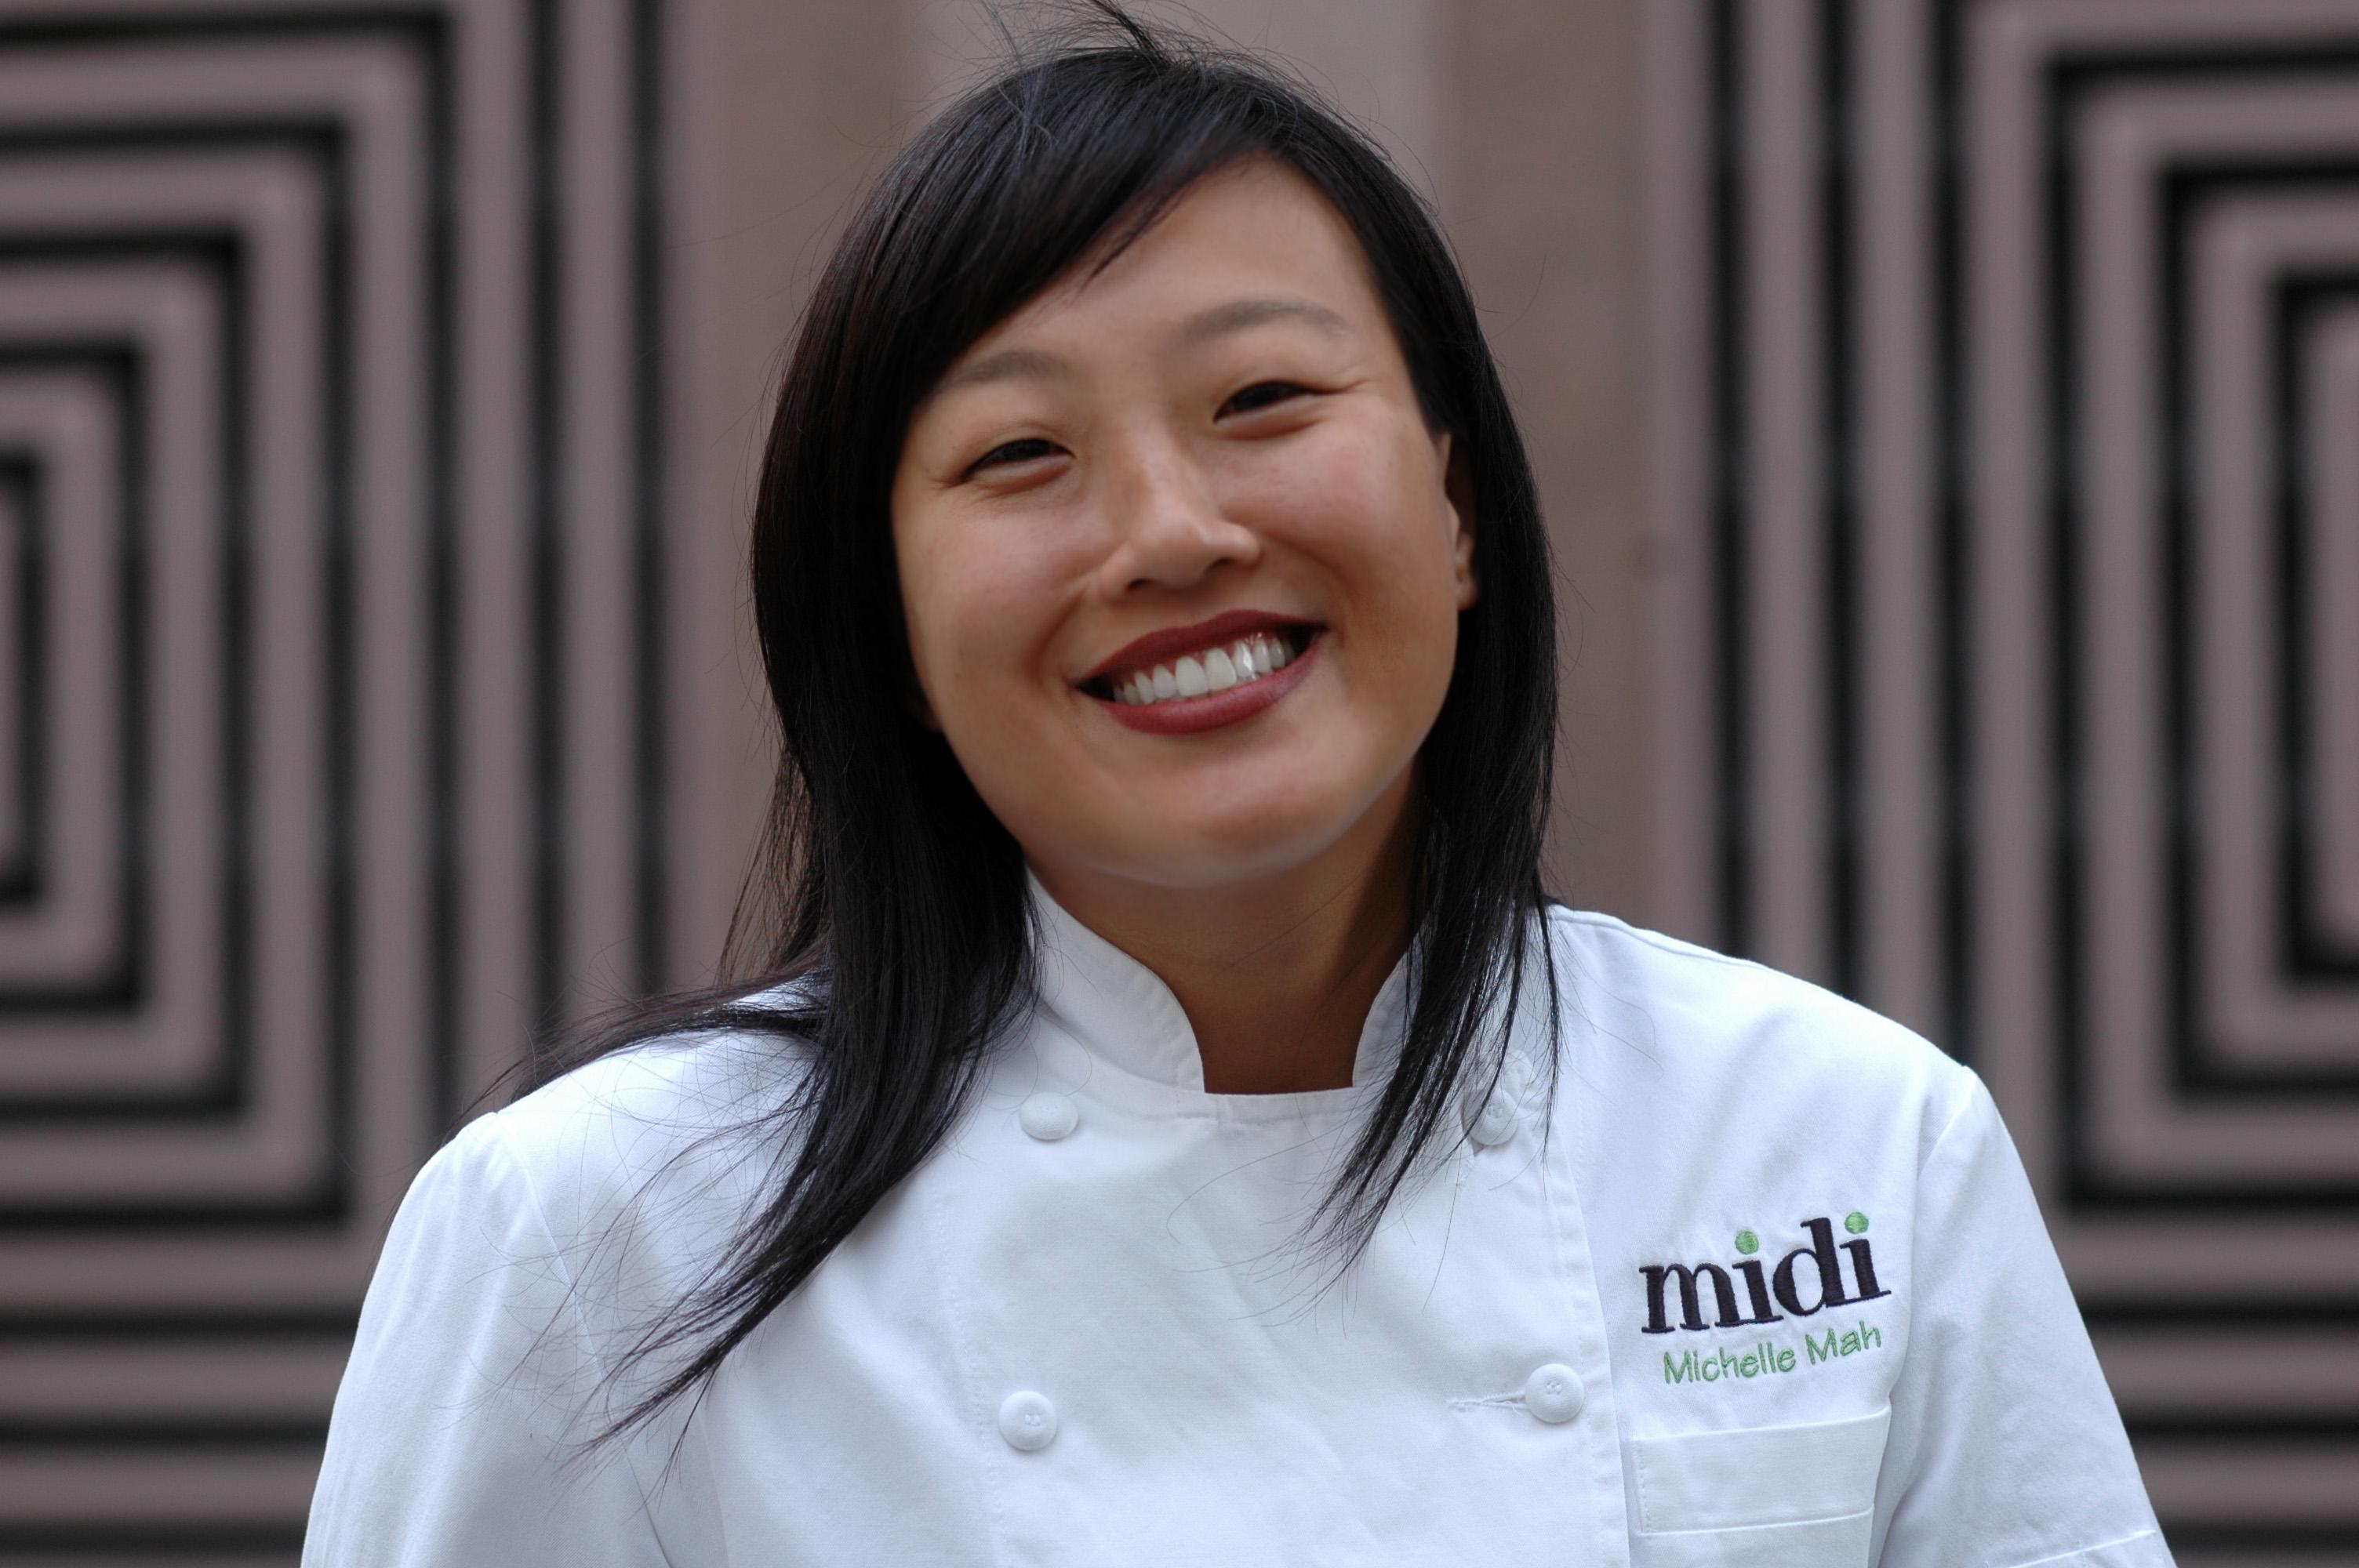 The Ahwahnee Announces 2010 Season Chefs Holidays Lineup